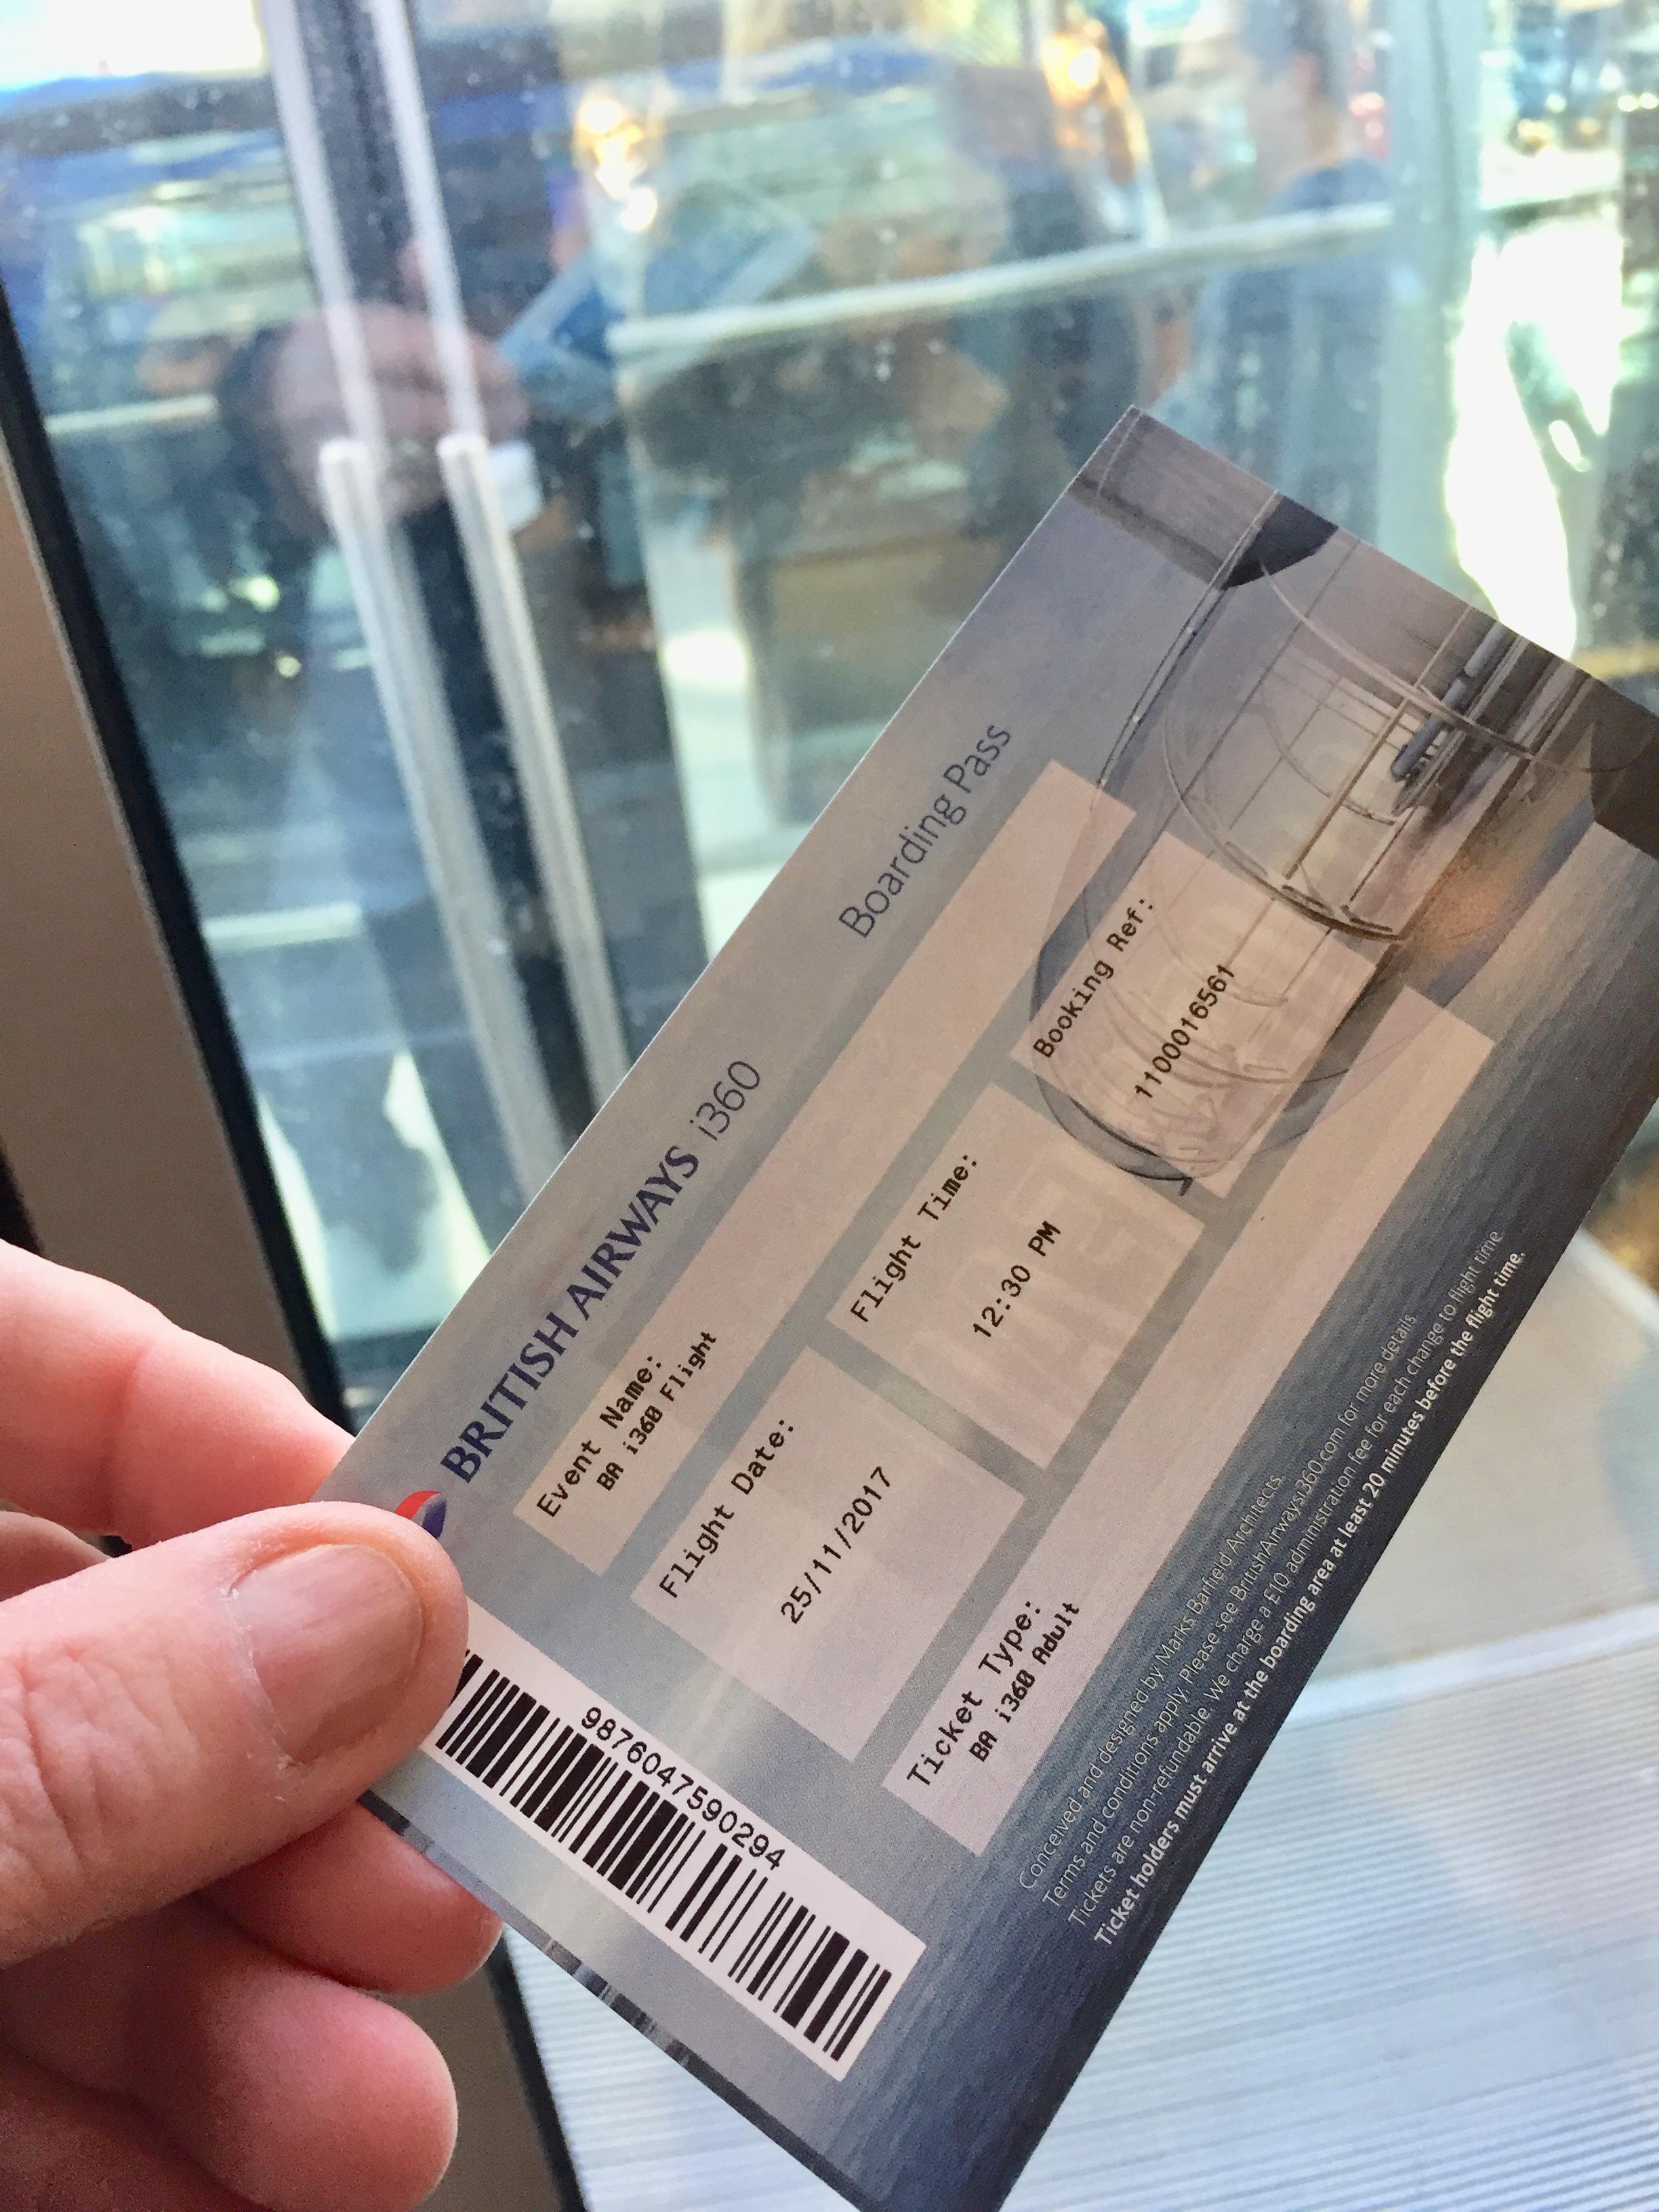 brighton 360i ticket.jpg